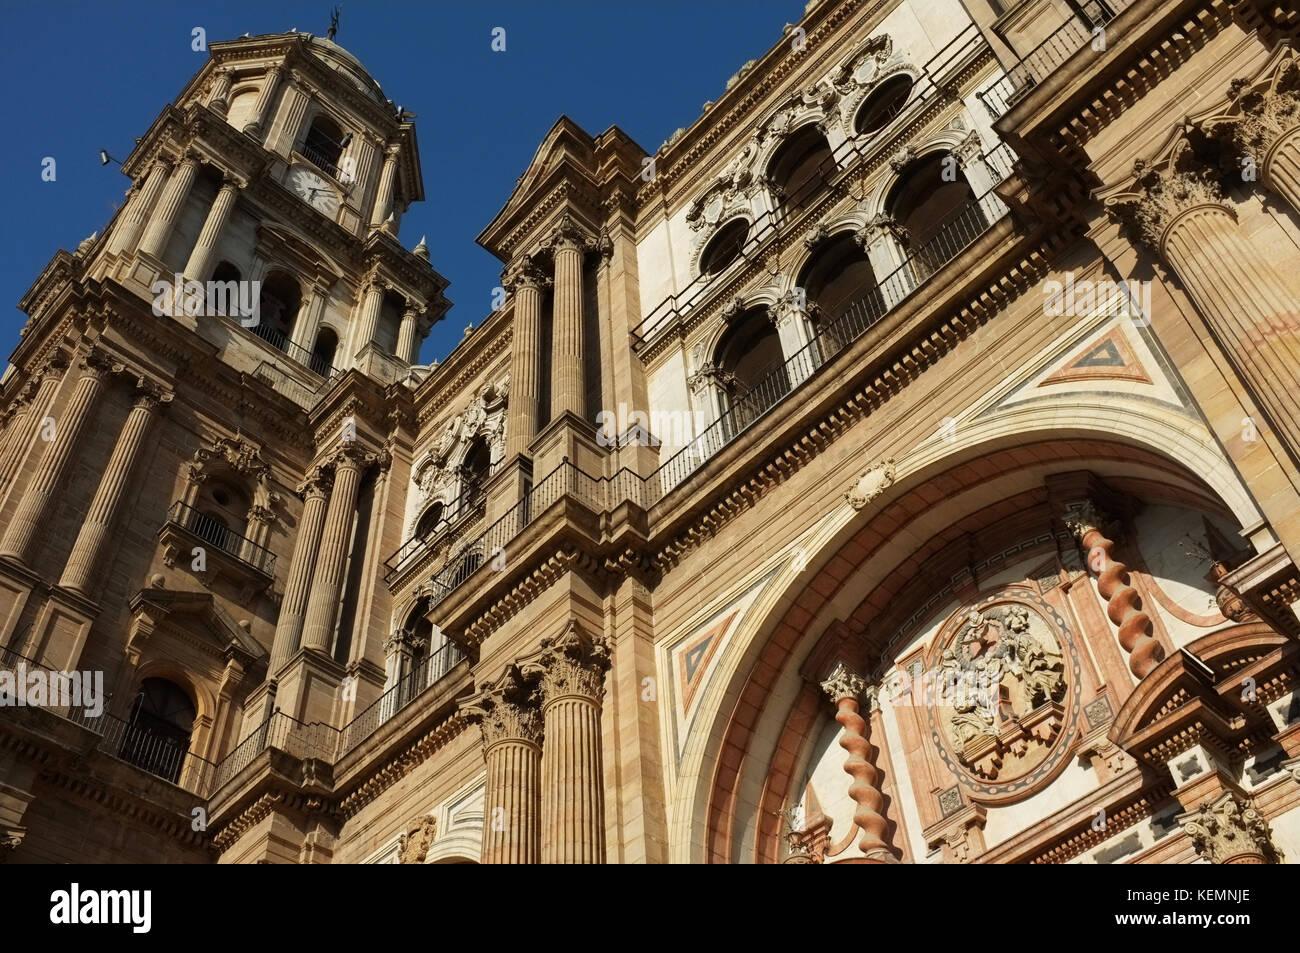 Málaga Cathedral, Malaga, Andalucia, Spain, September 2017 - Stock Image